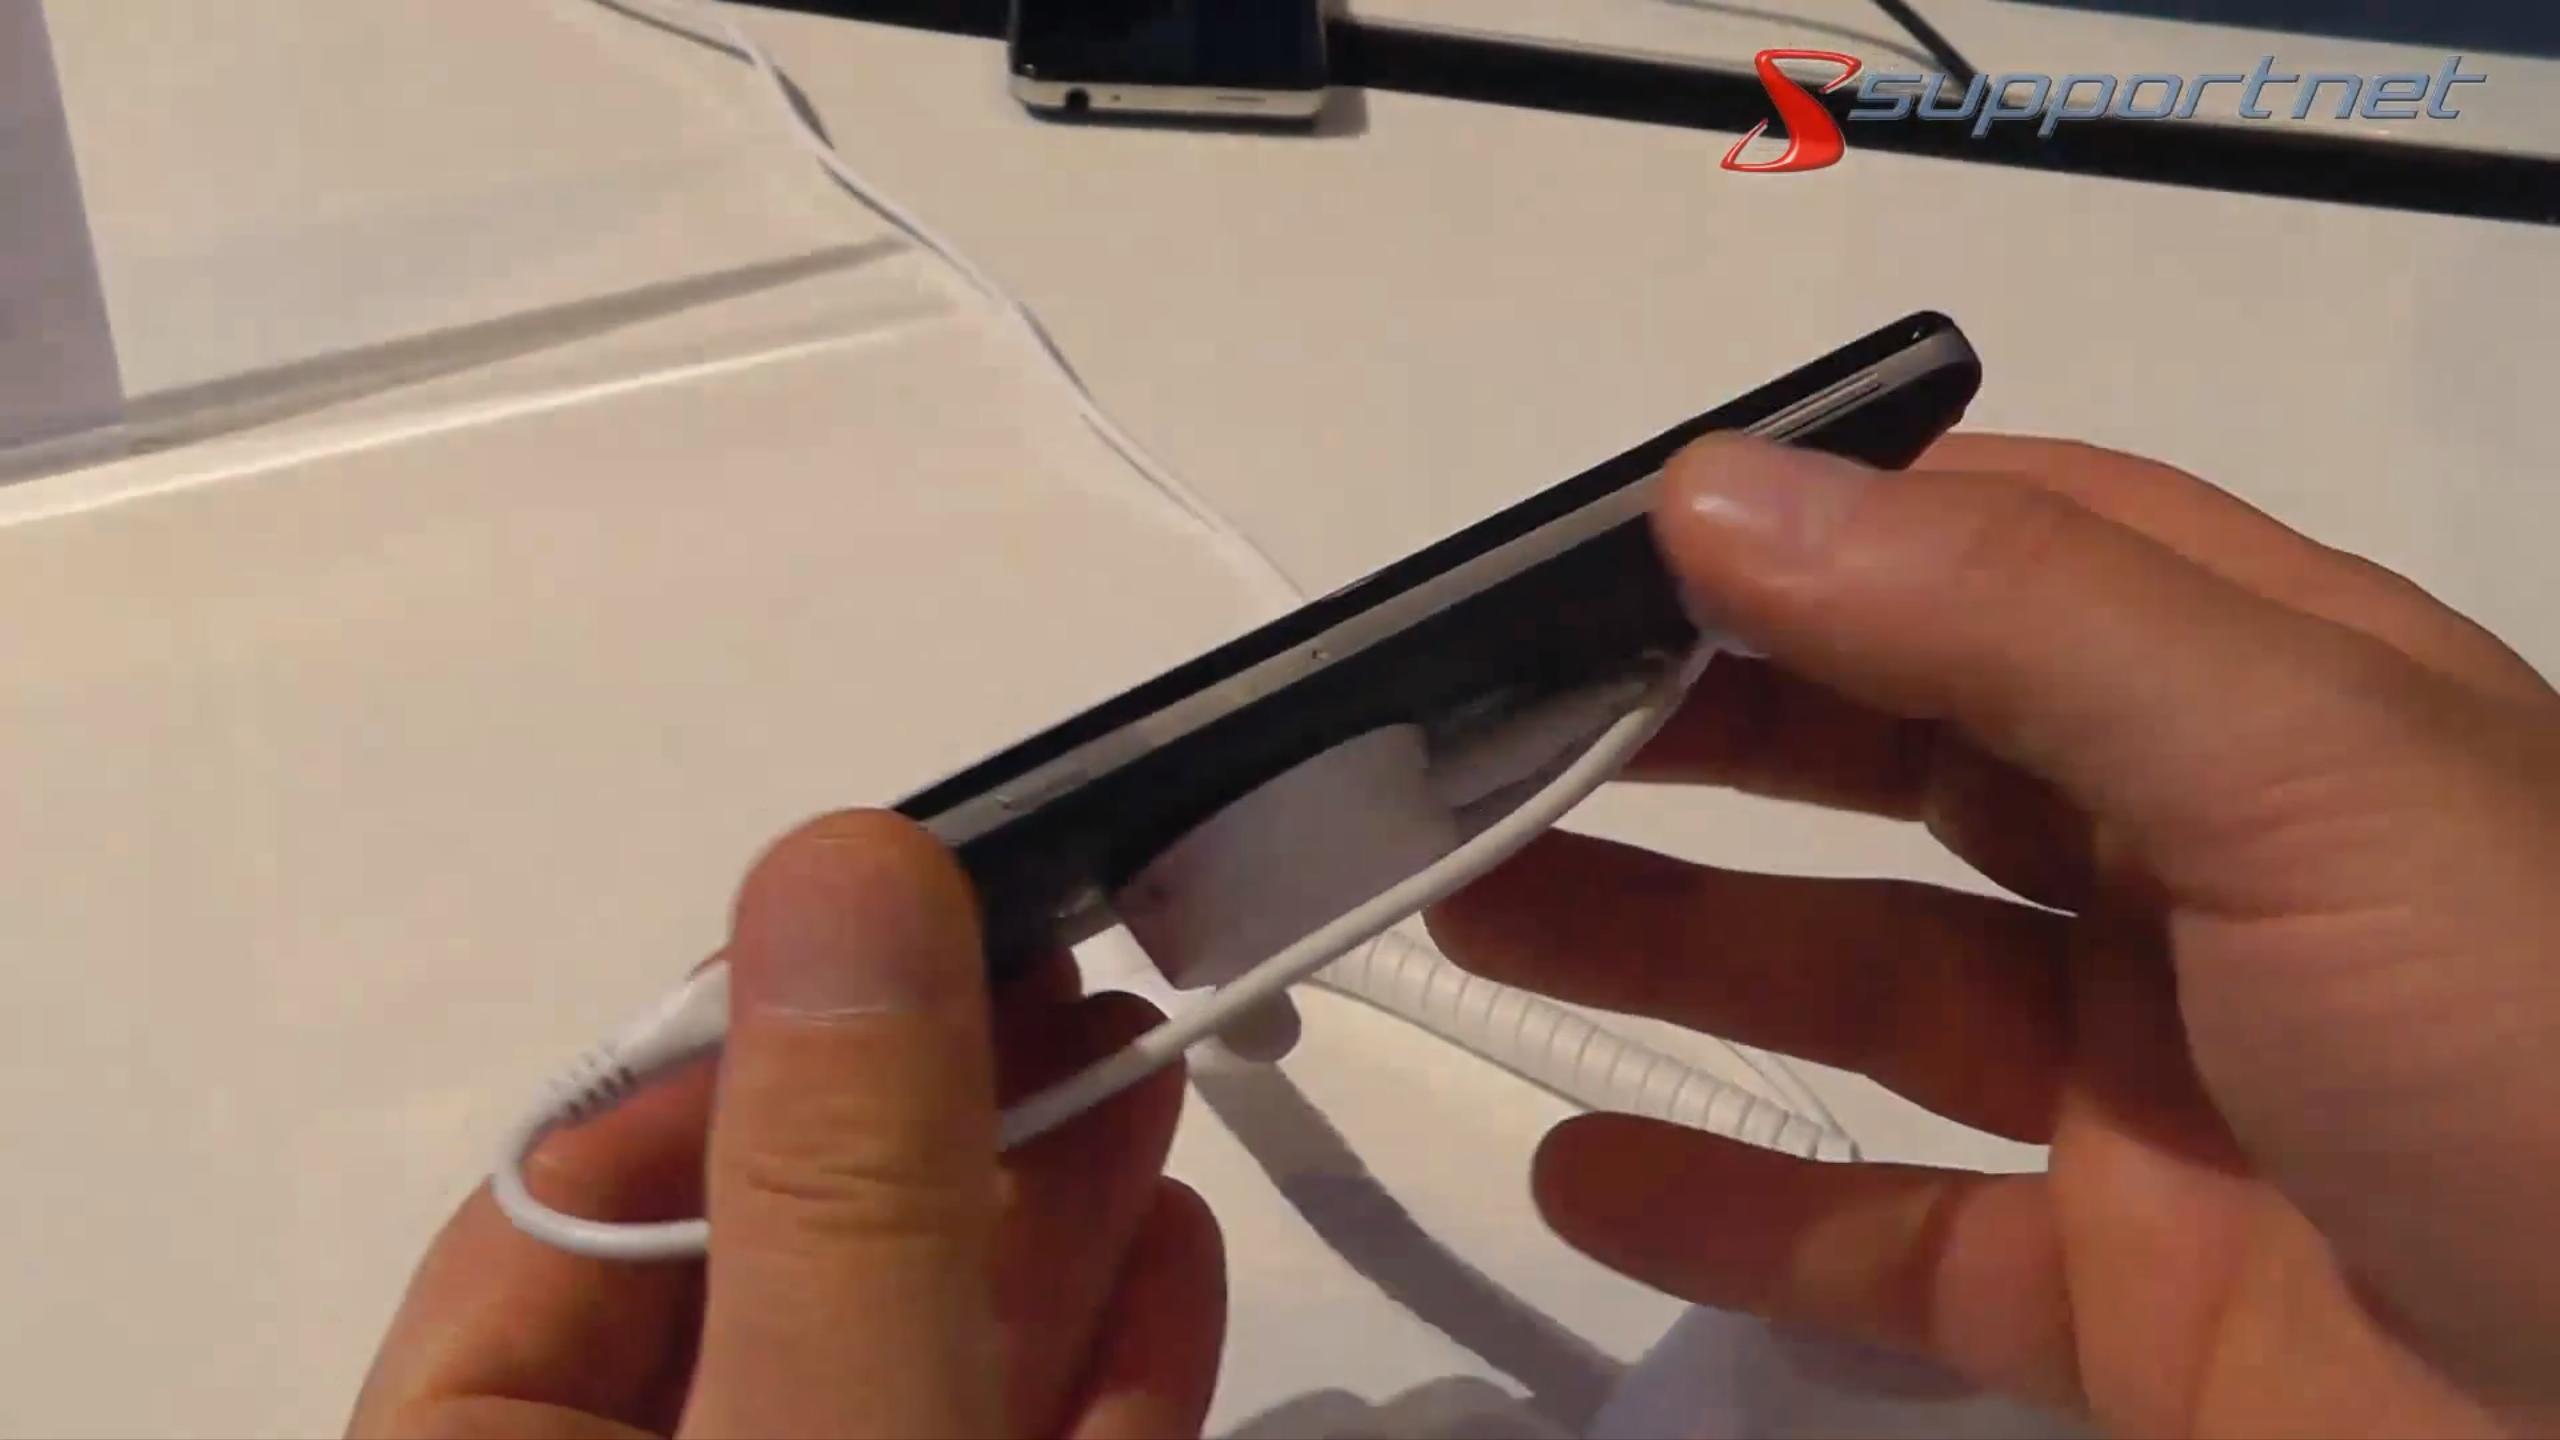 02-smartphone-megafone-mint-intel-chip-470.png?nocache=1348647153603